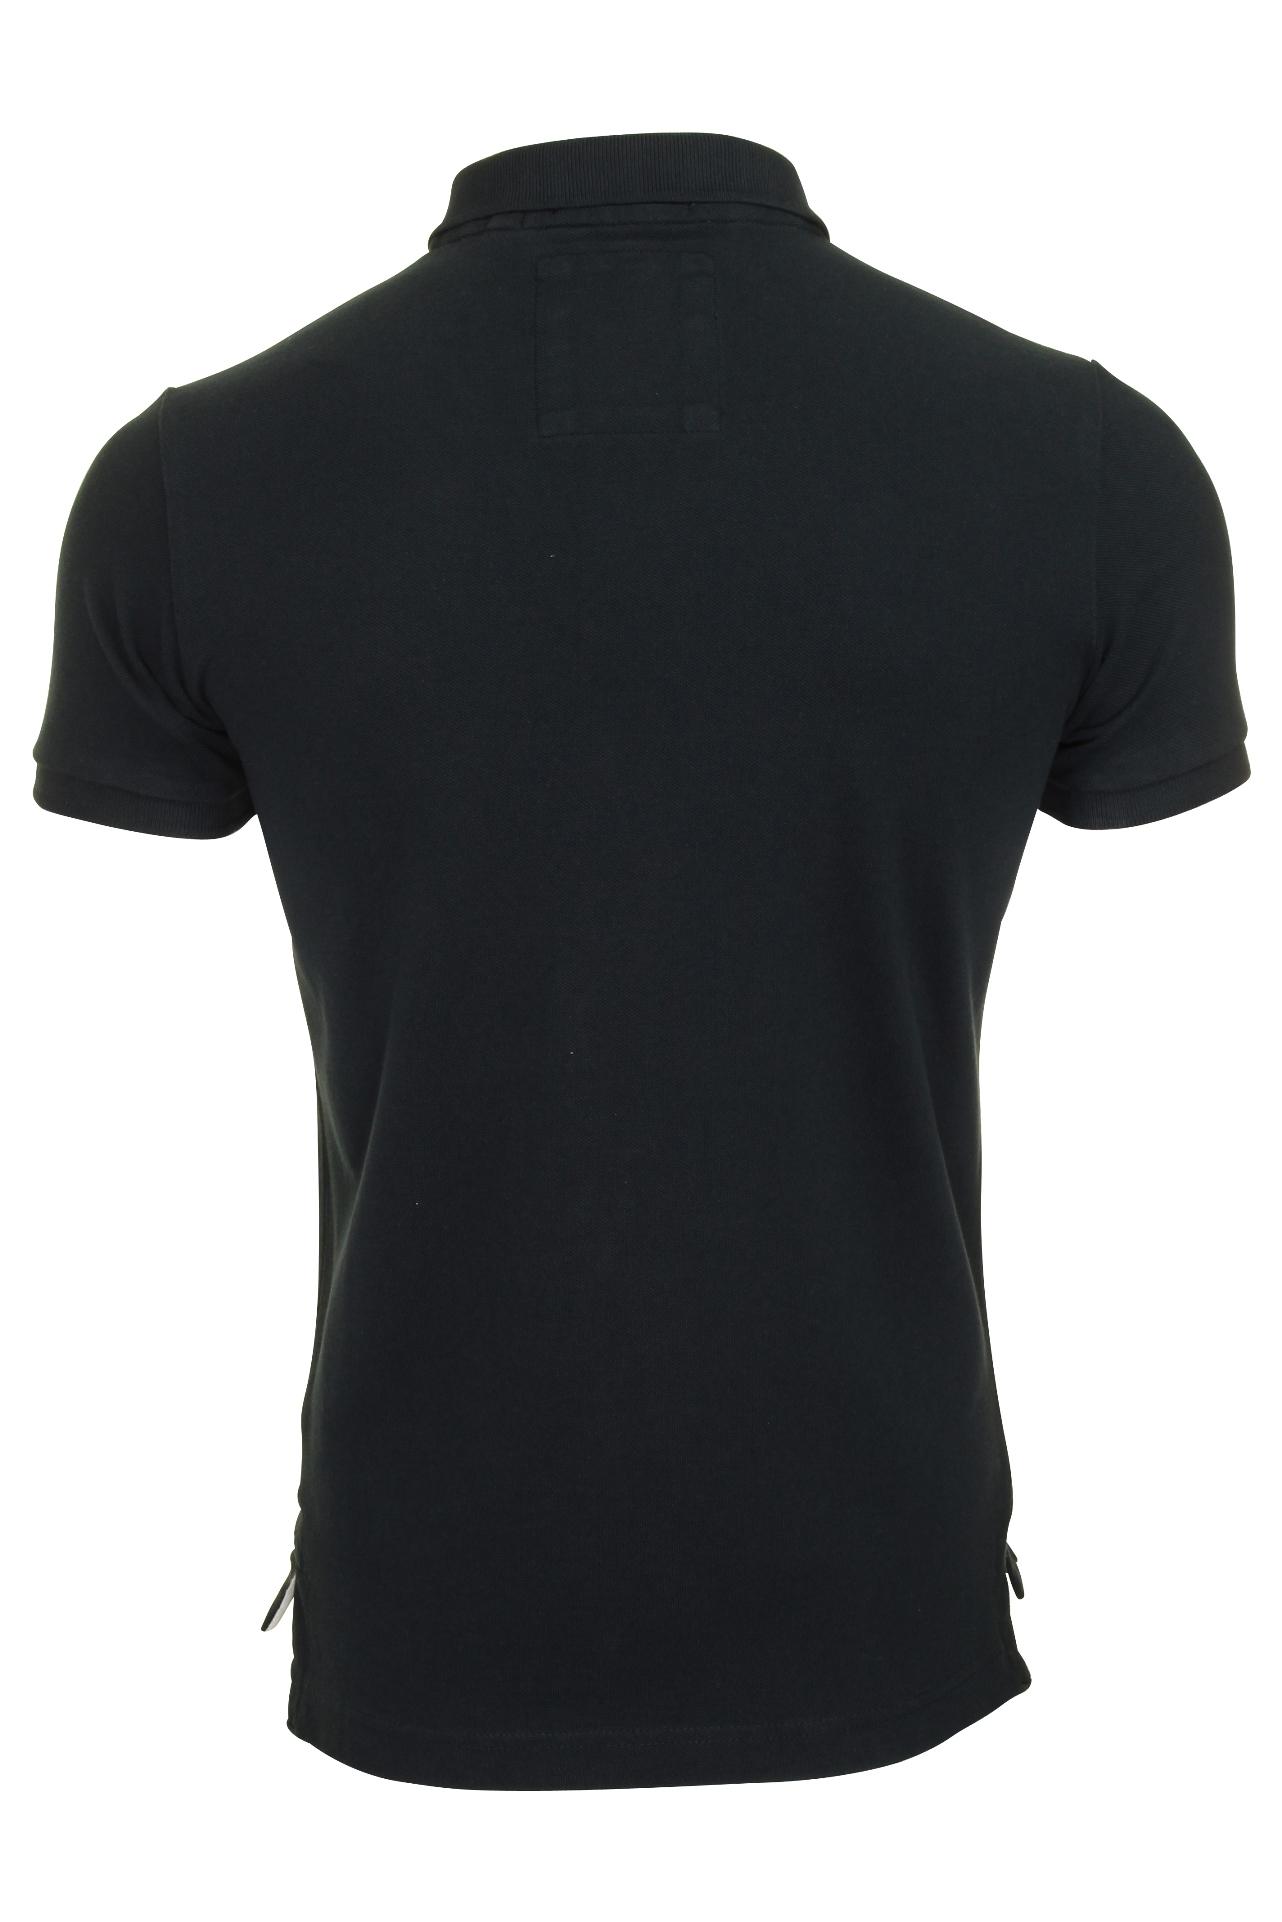 Camisa-clasica-para-hombre-039-Camiseta-Polo-Pique-039 miniatura 8